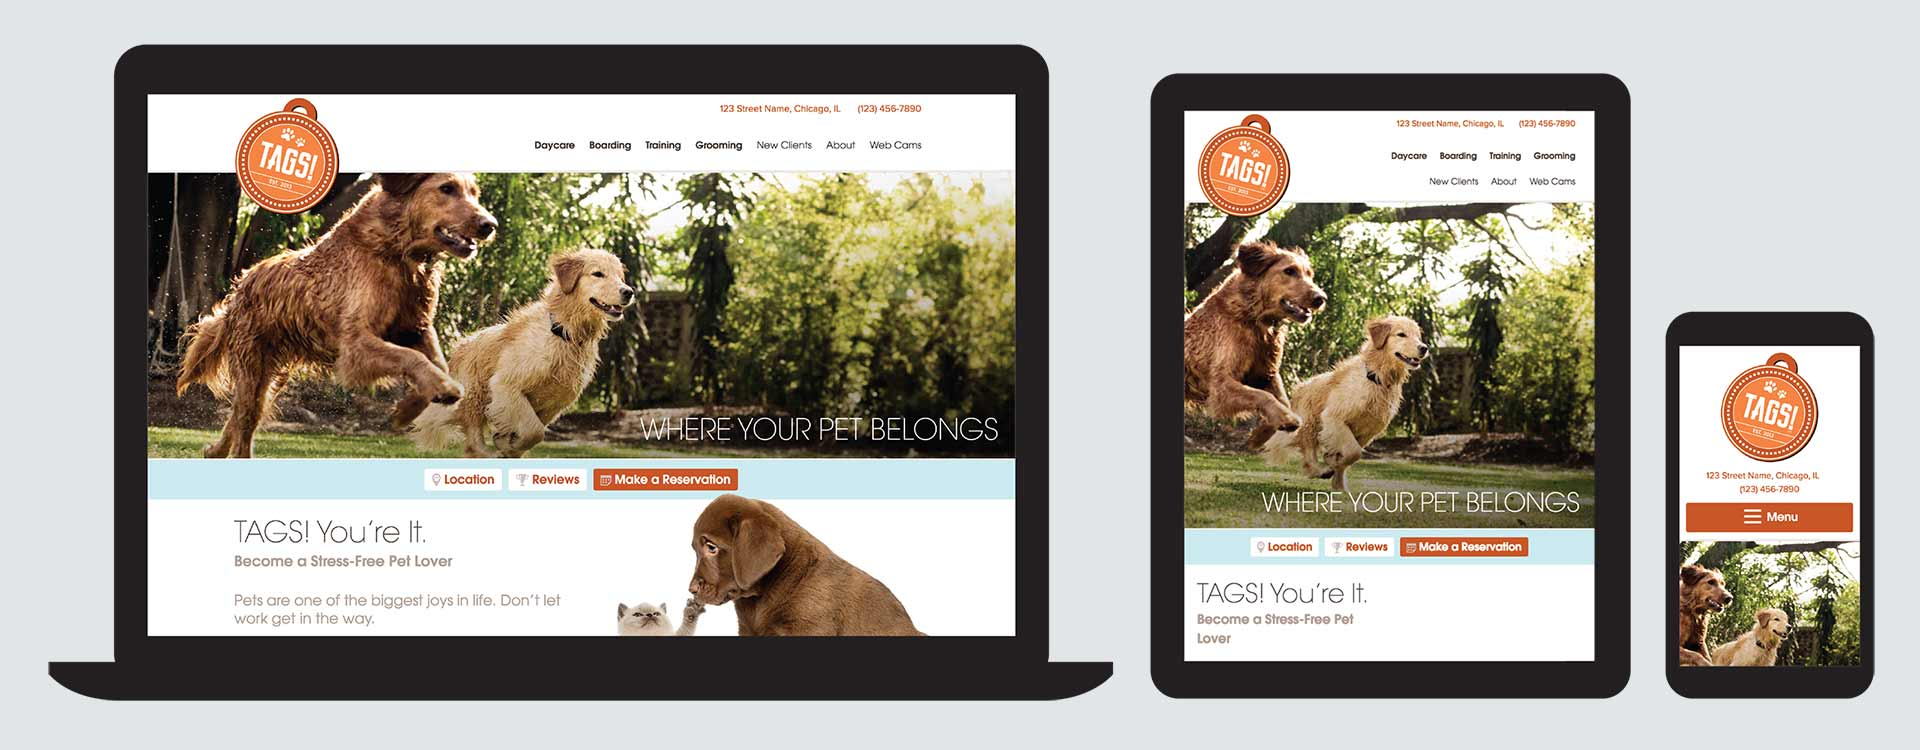 TAGS! Pet Care Club screenshots